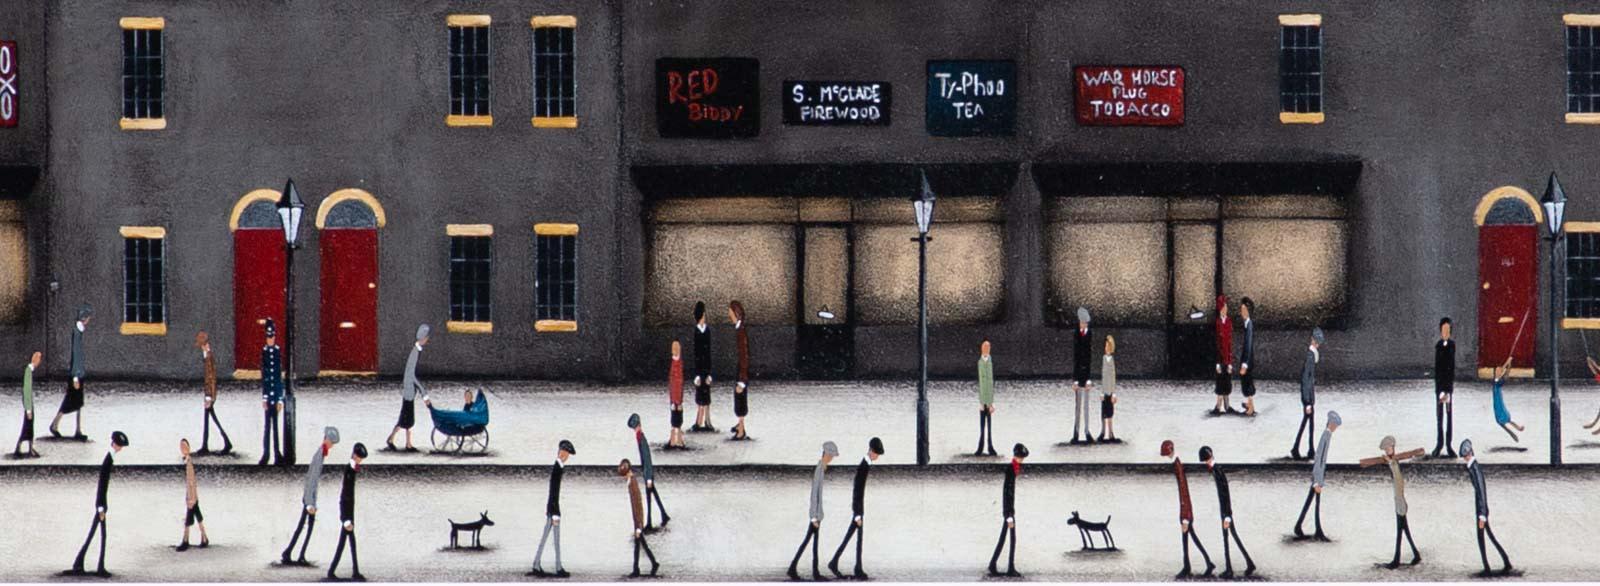 The High Street